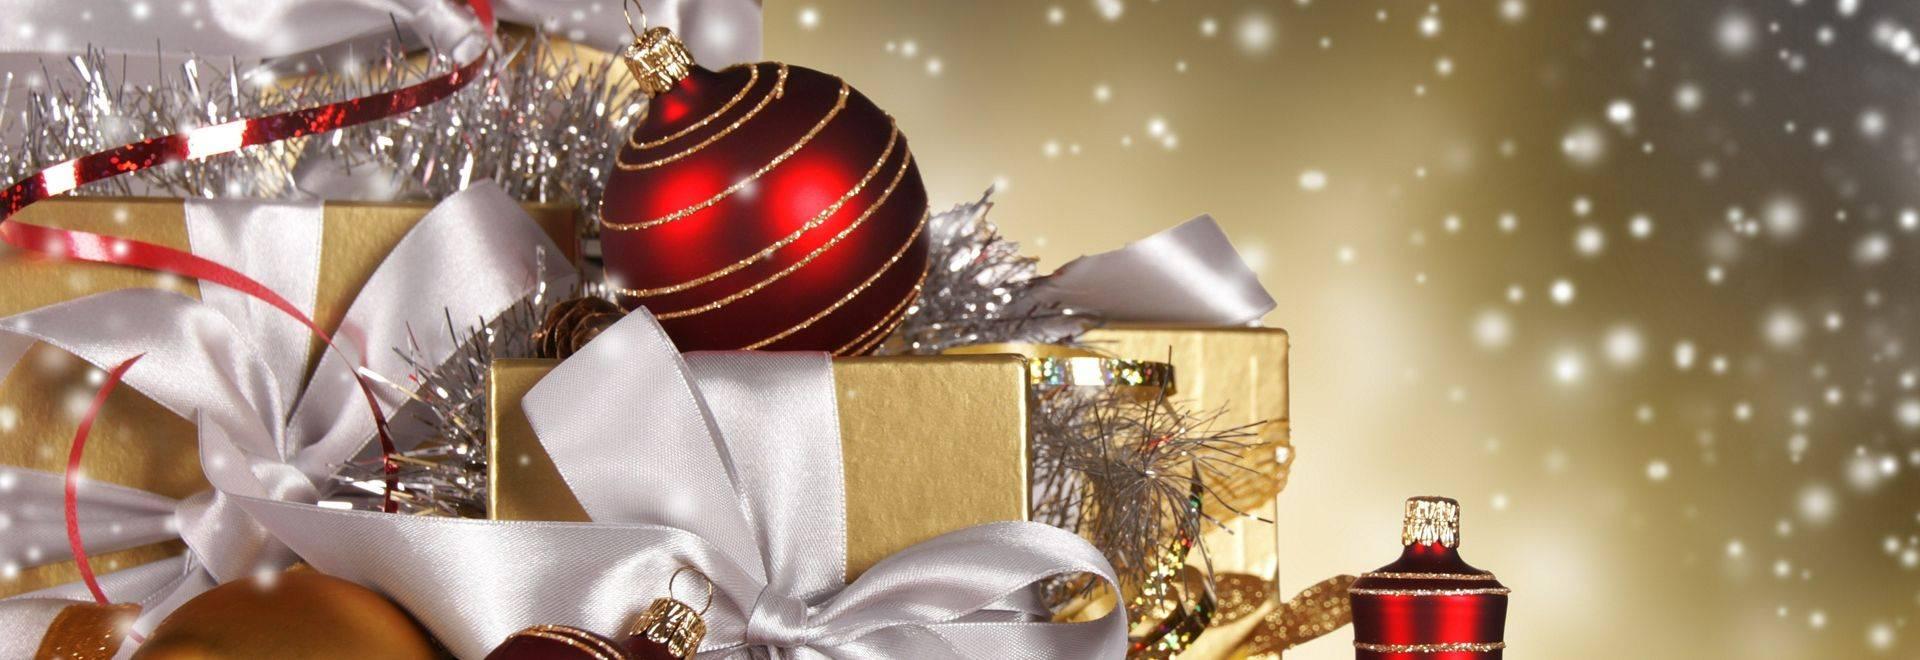 Shutterstock 116171284 Christmas Background